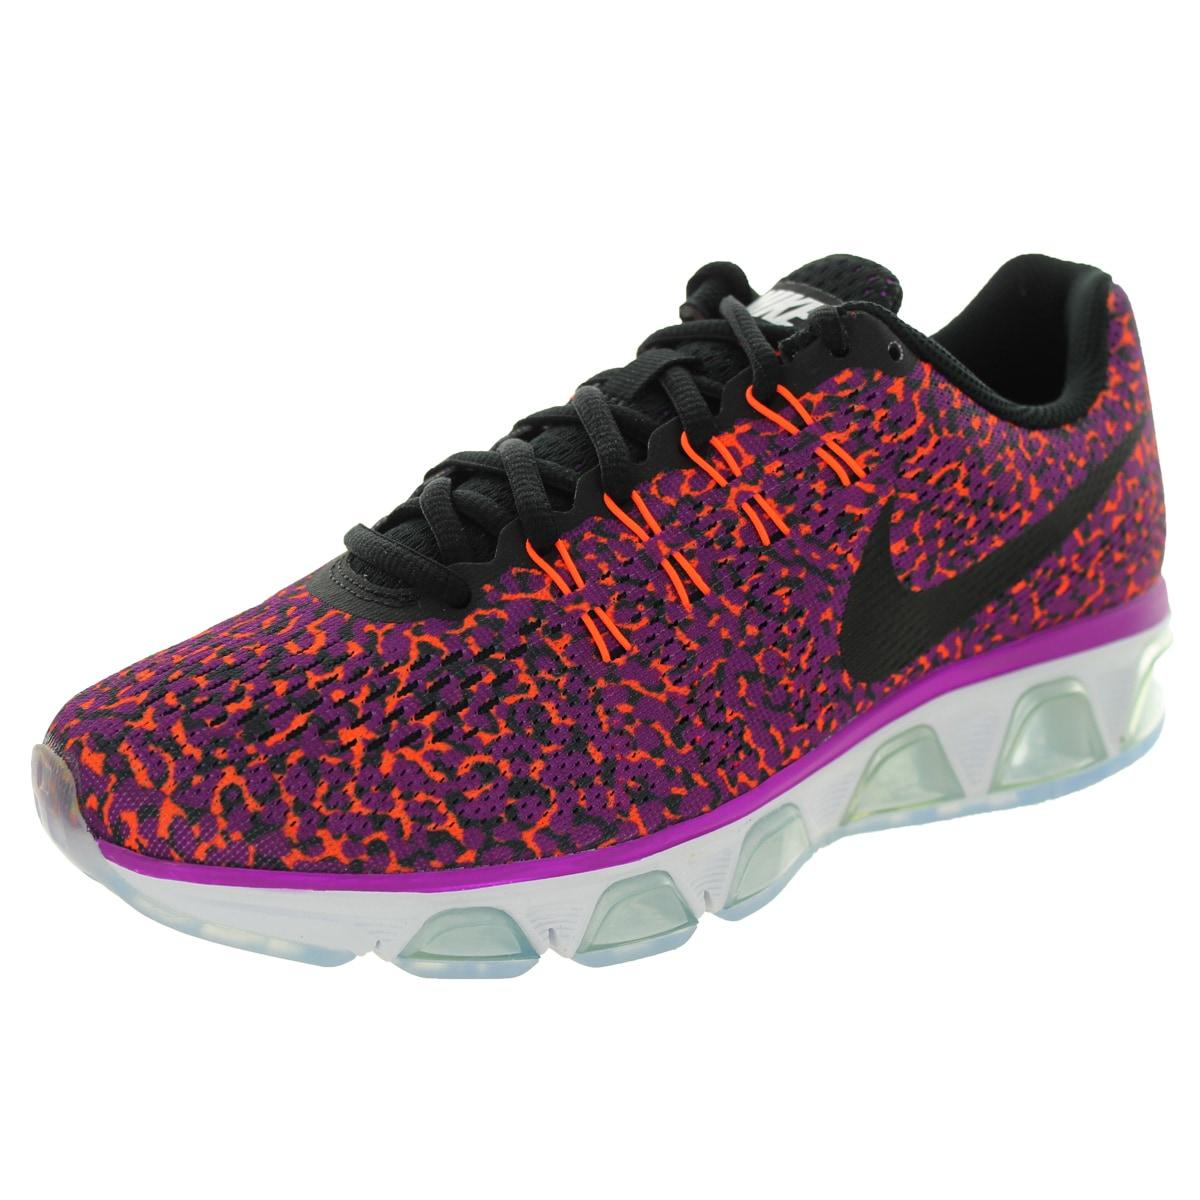 best authentic baea6 d845b ... coupon for shop nike womens air max tailwind 8 vvd purple white black  orange running shoe